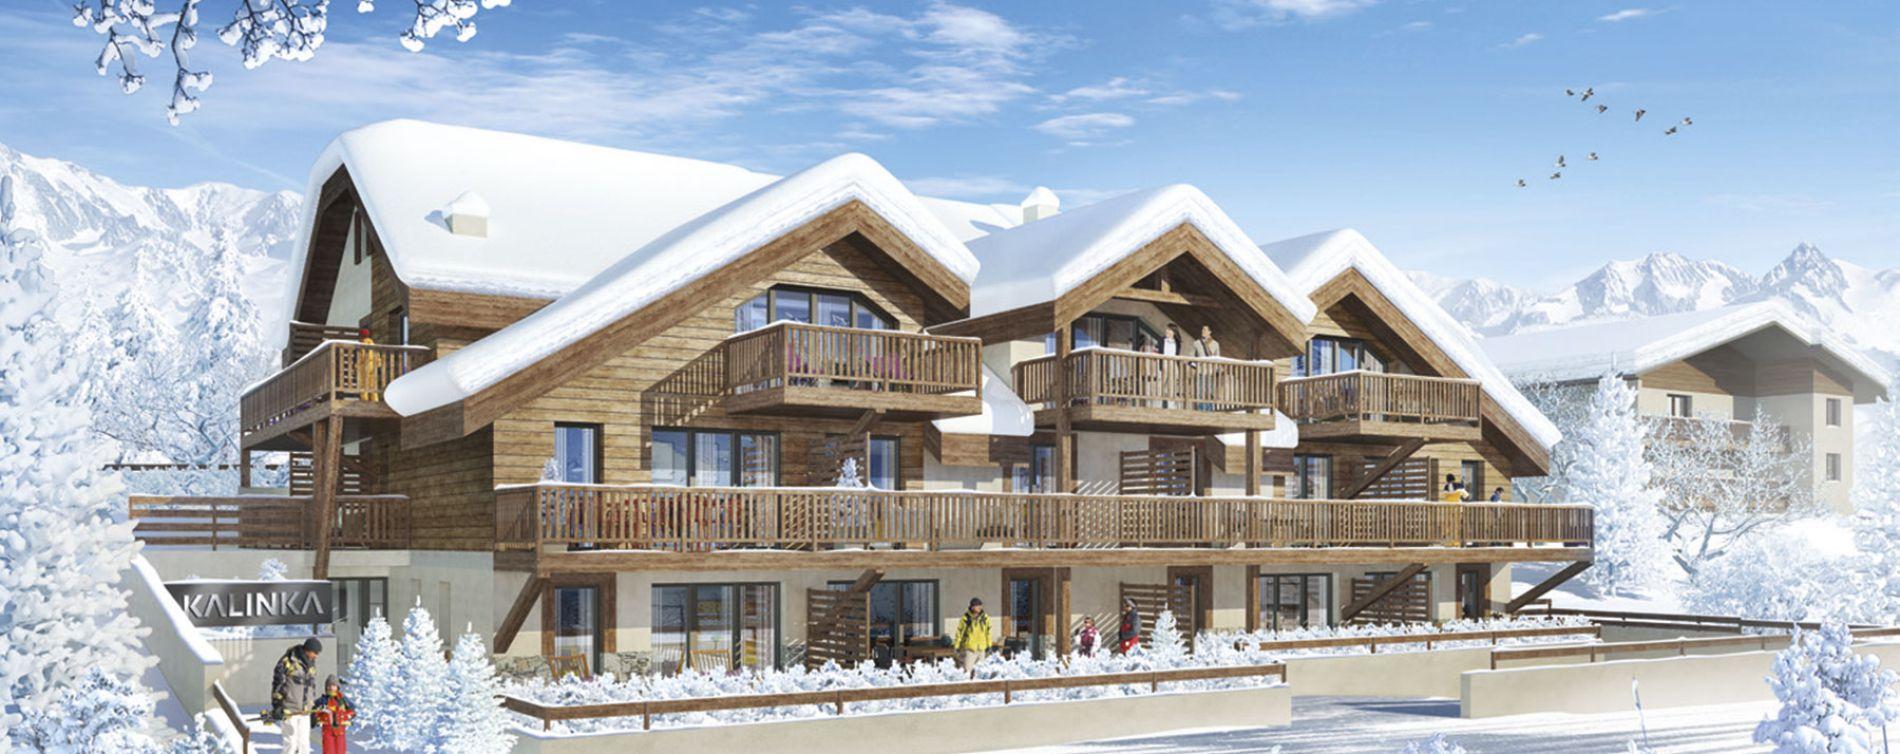 Saint-Chaffrey : programme immobilier neuve « Kalinka » (2)